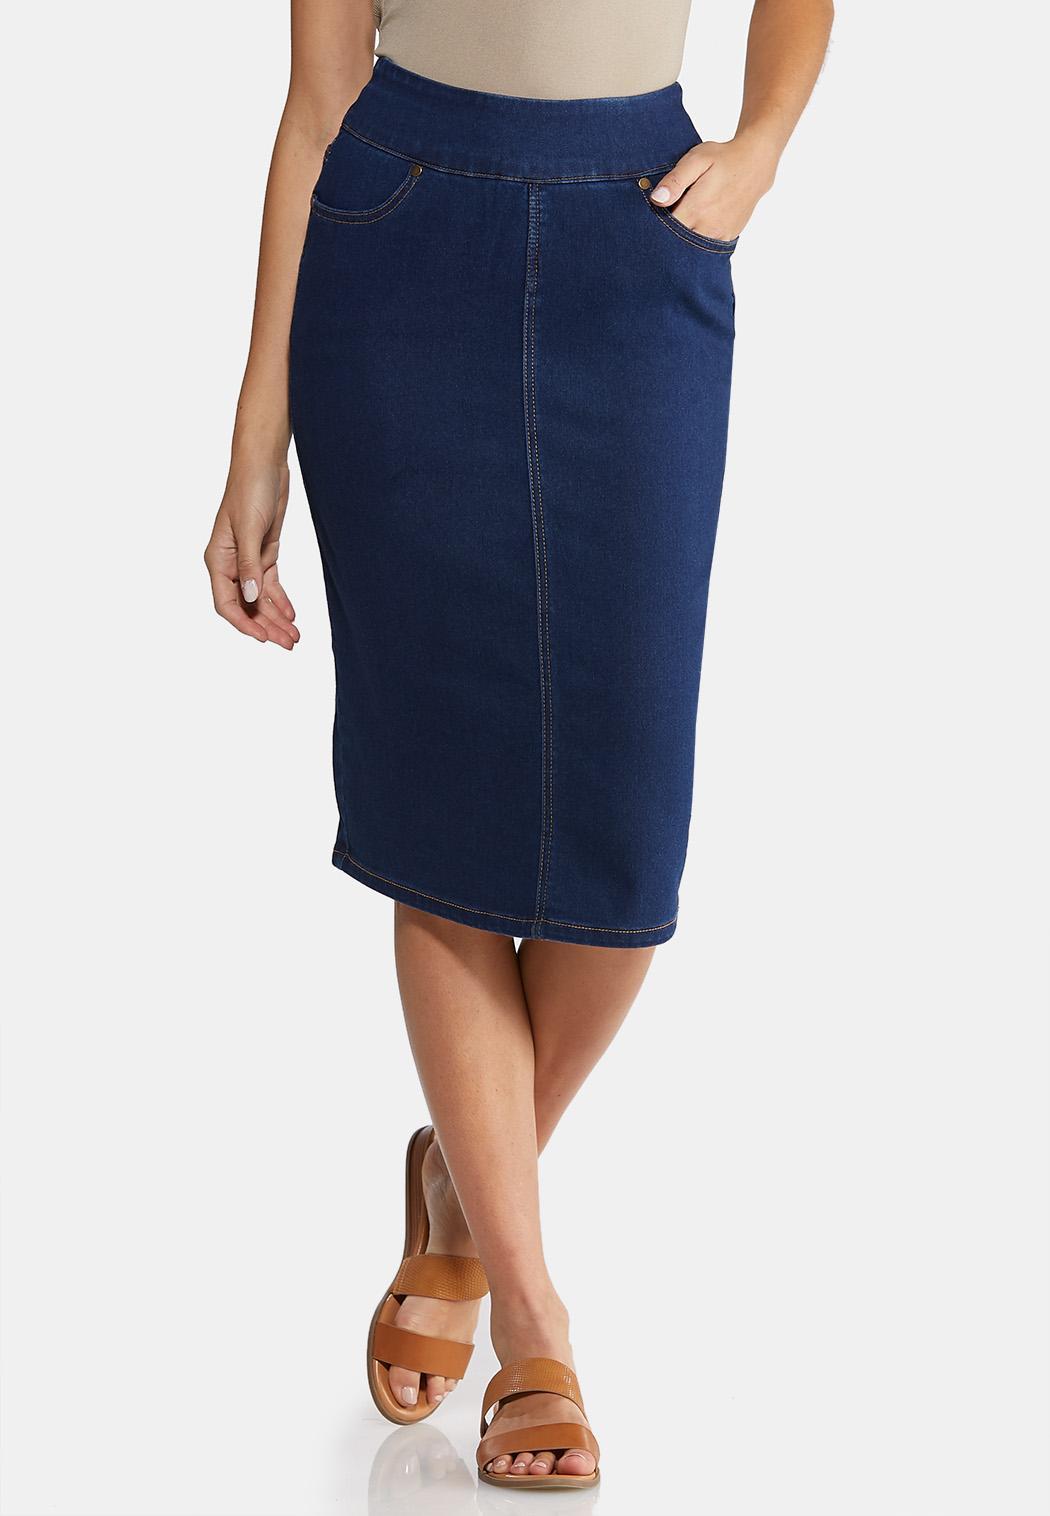 Plus Size Pull-On Denim Skirt